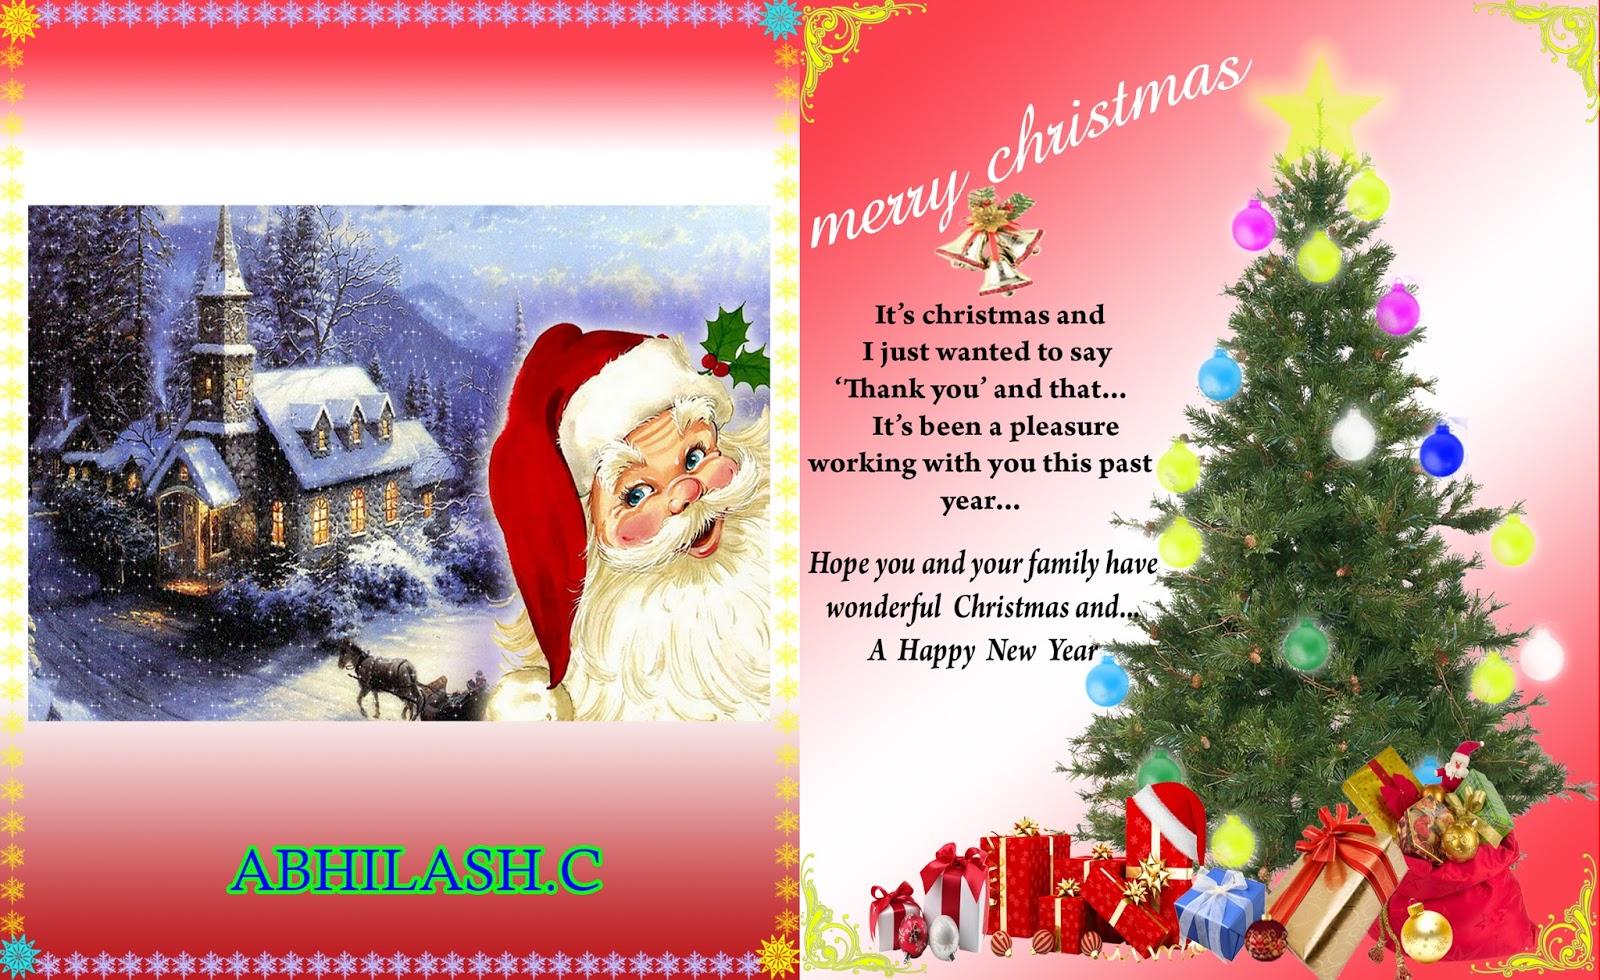 Abhilashchandrantdy Greeting Cards